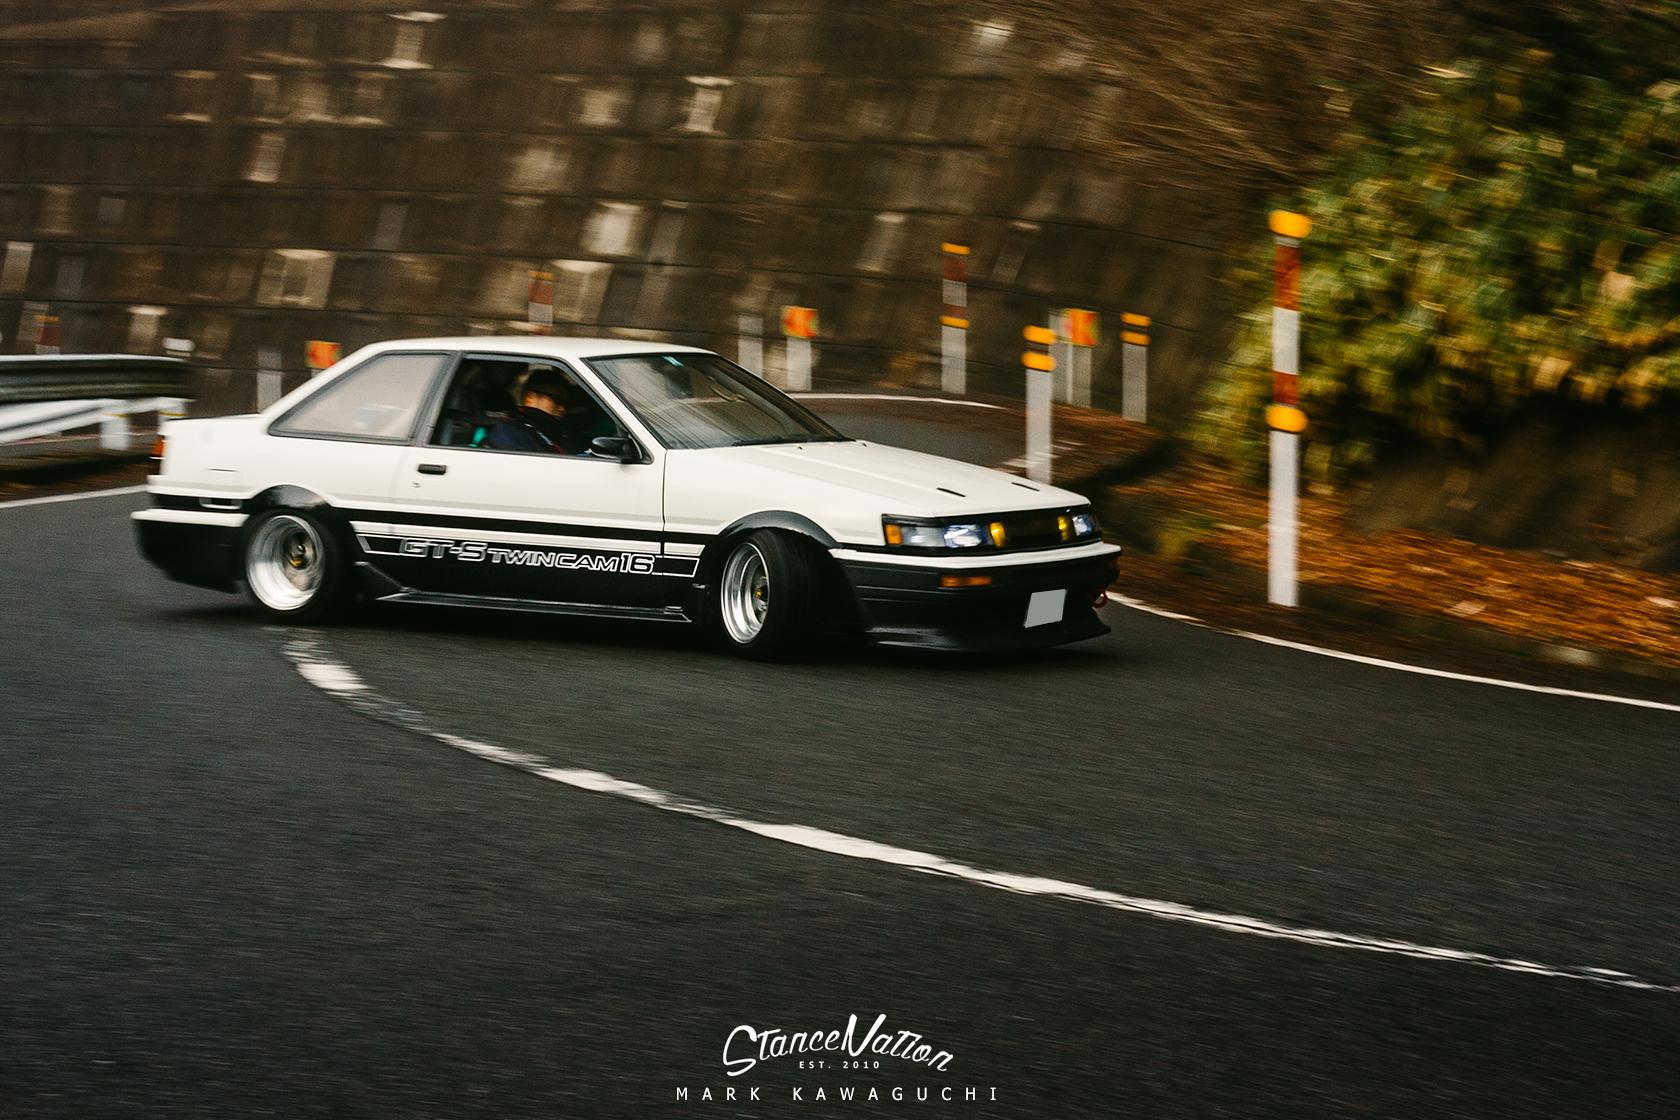 Toyota Corolla 1986 E80 Owners Fans Club Pakwheels Ae86 Fuse Box Hiroshima Hachiroku Drift 151680x1120 159 Mb